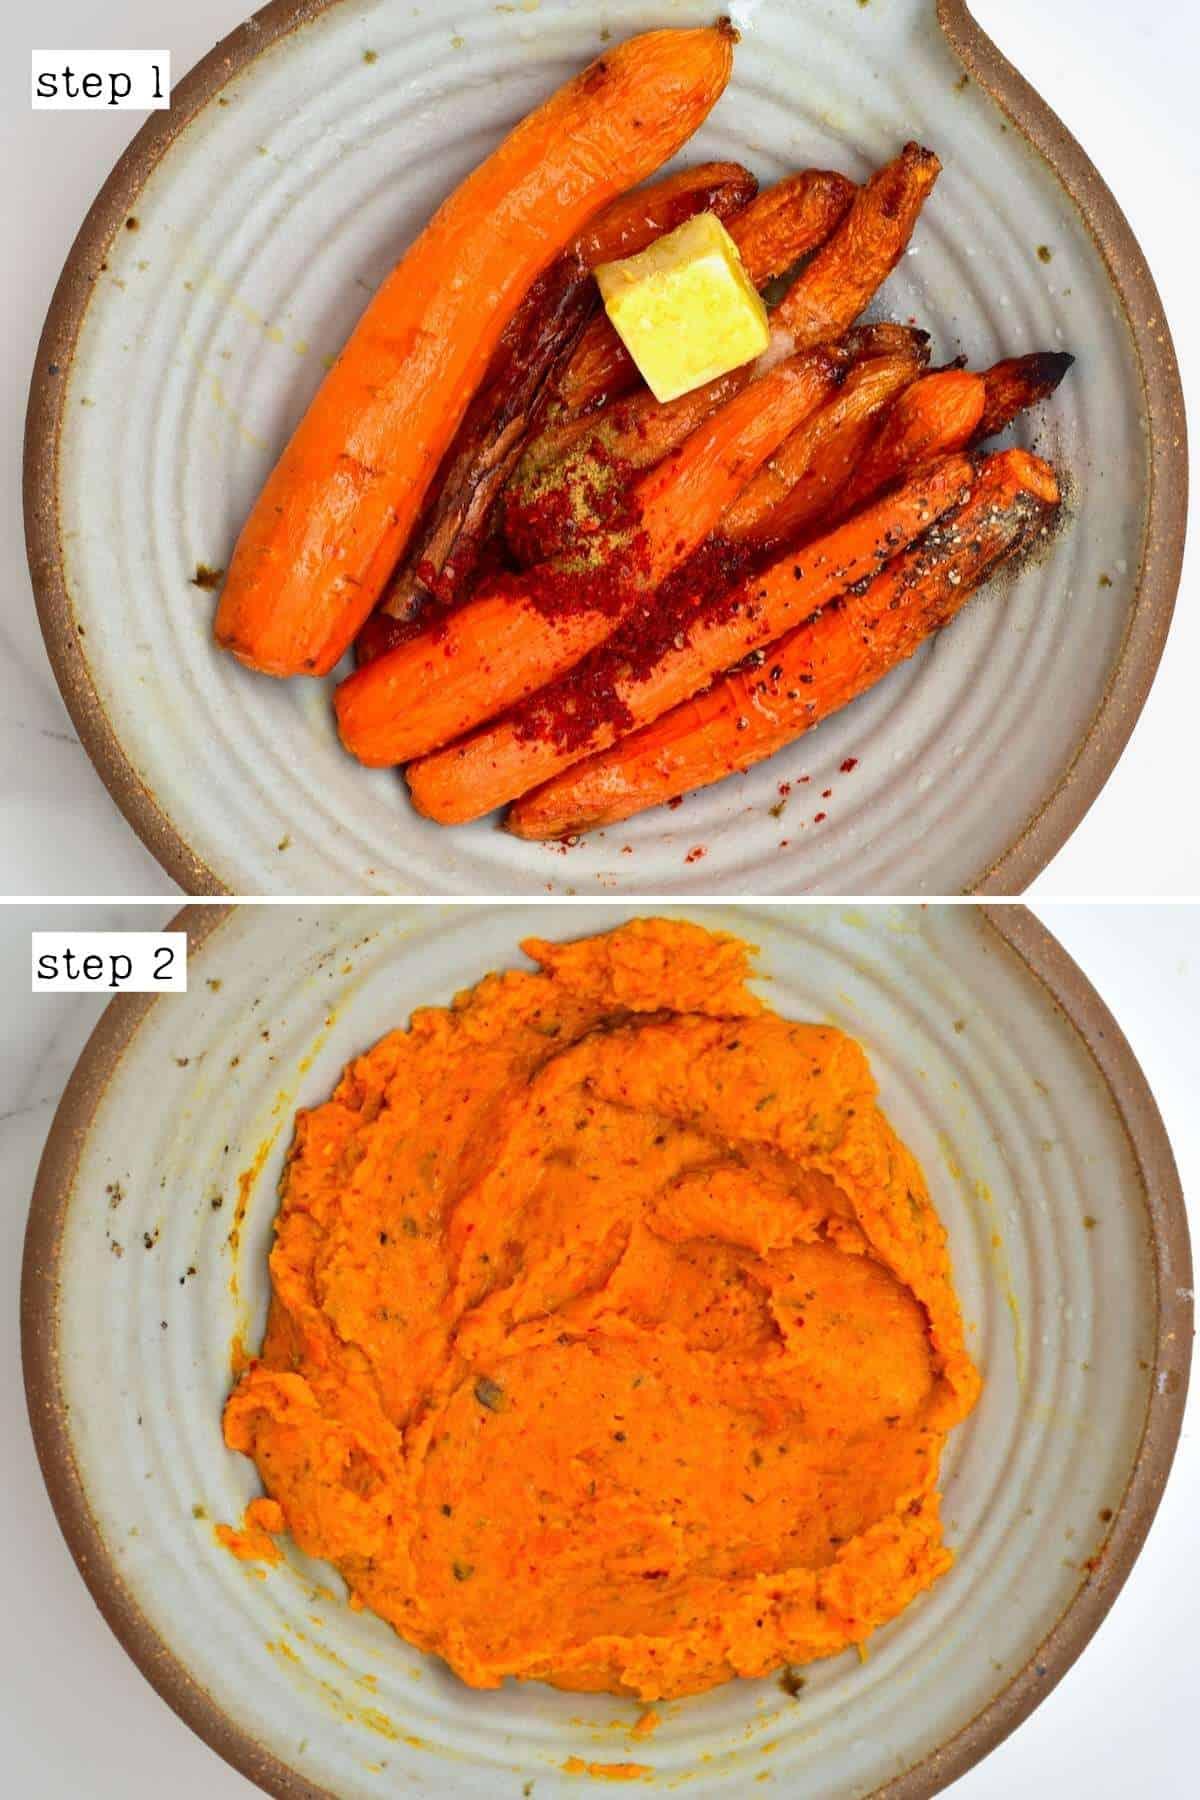 Steps for making roasted carrot dip